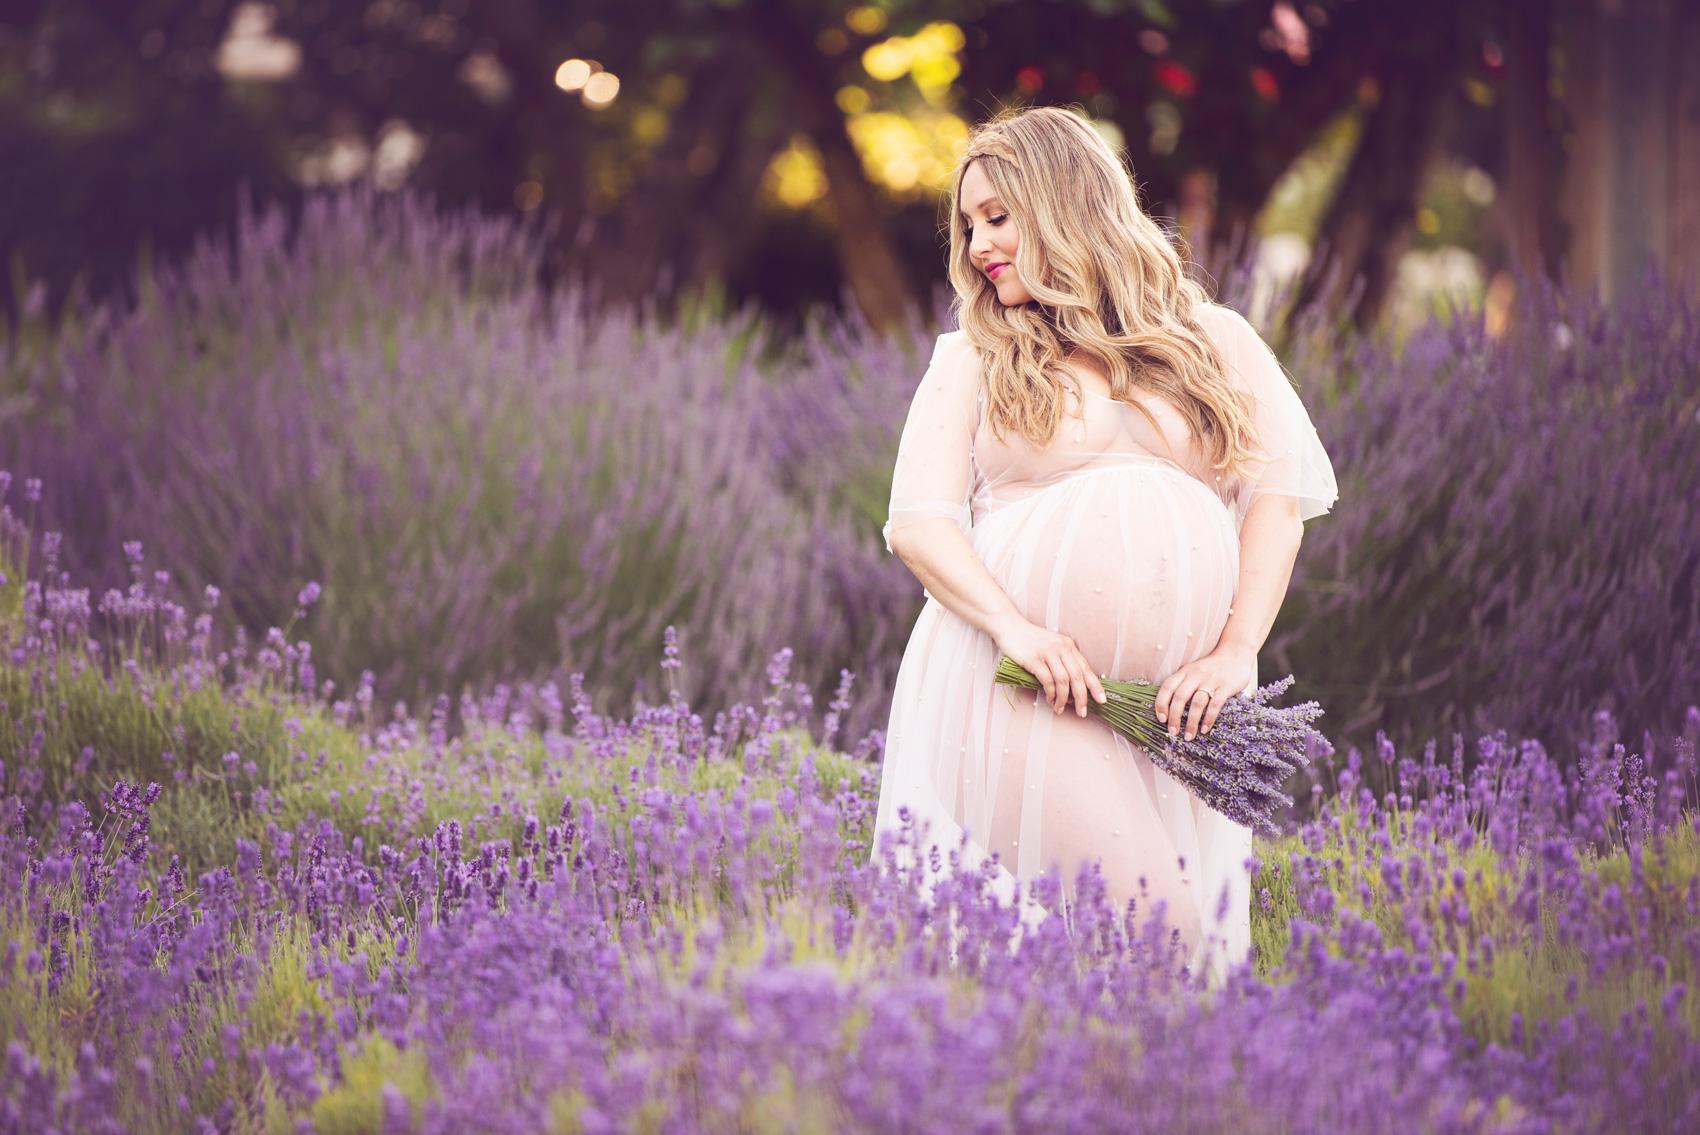 Dallas Maternity Photographer, Babymoon Photographer, Travel Photographer, Destination Photographer, Luxury Maternity Photographer, NYC Maternity Photographer, Seattle Maternity Photographer